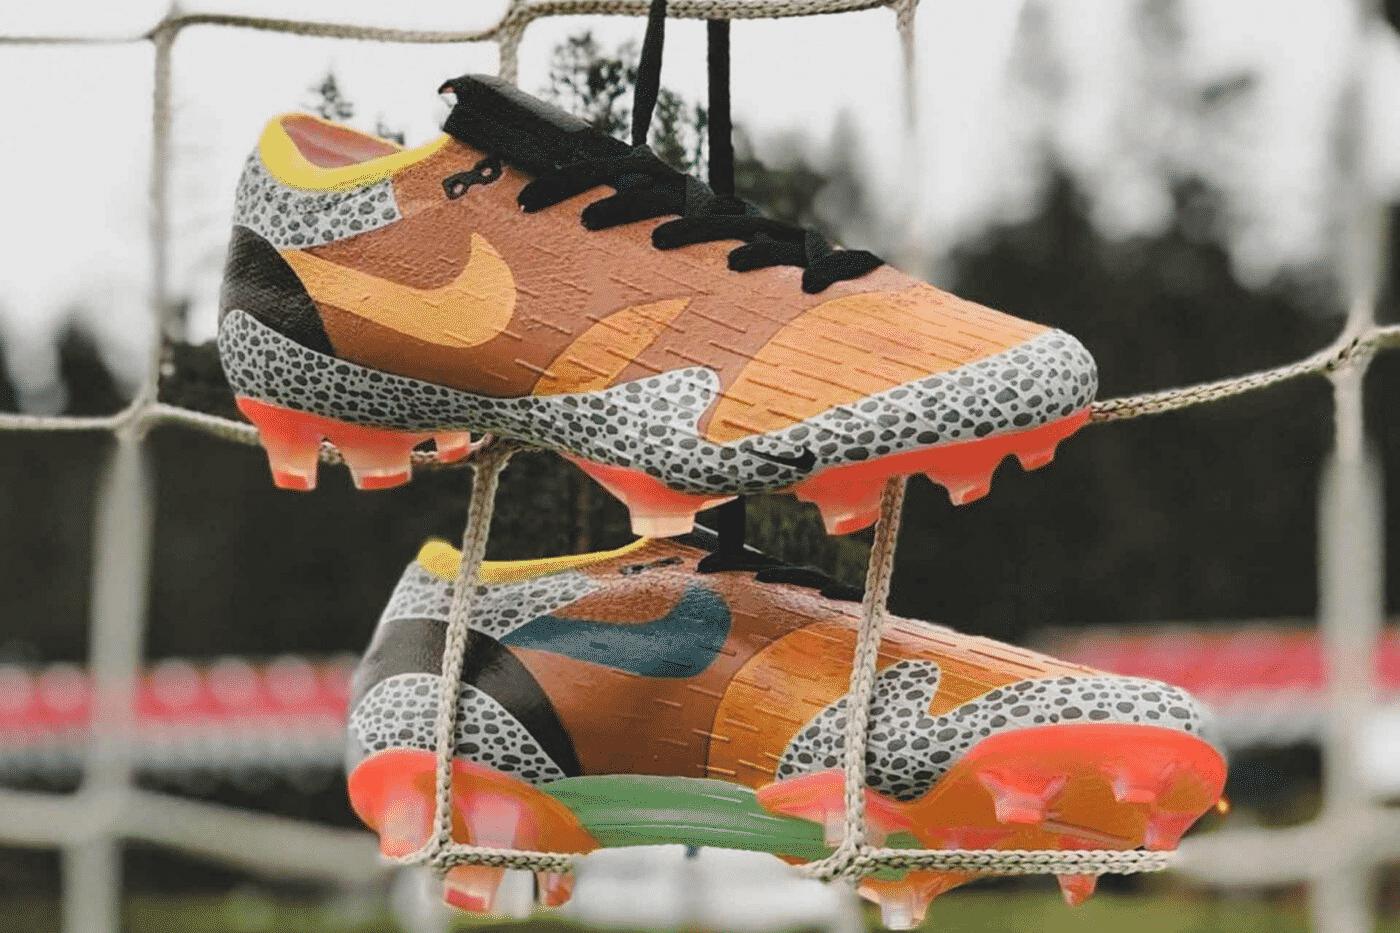 chaussures-football-nike-mercurial-vapor-air-max-day-custom-1